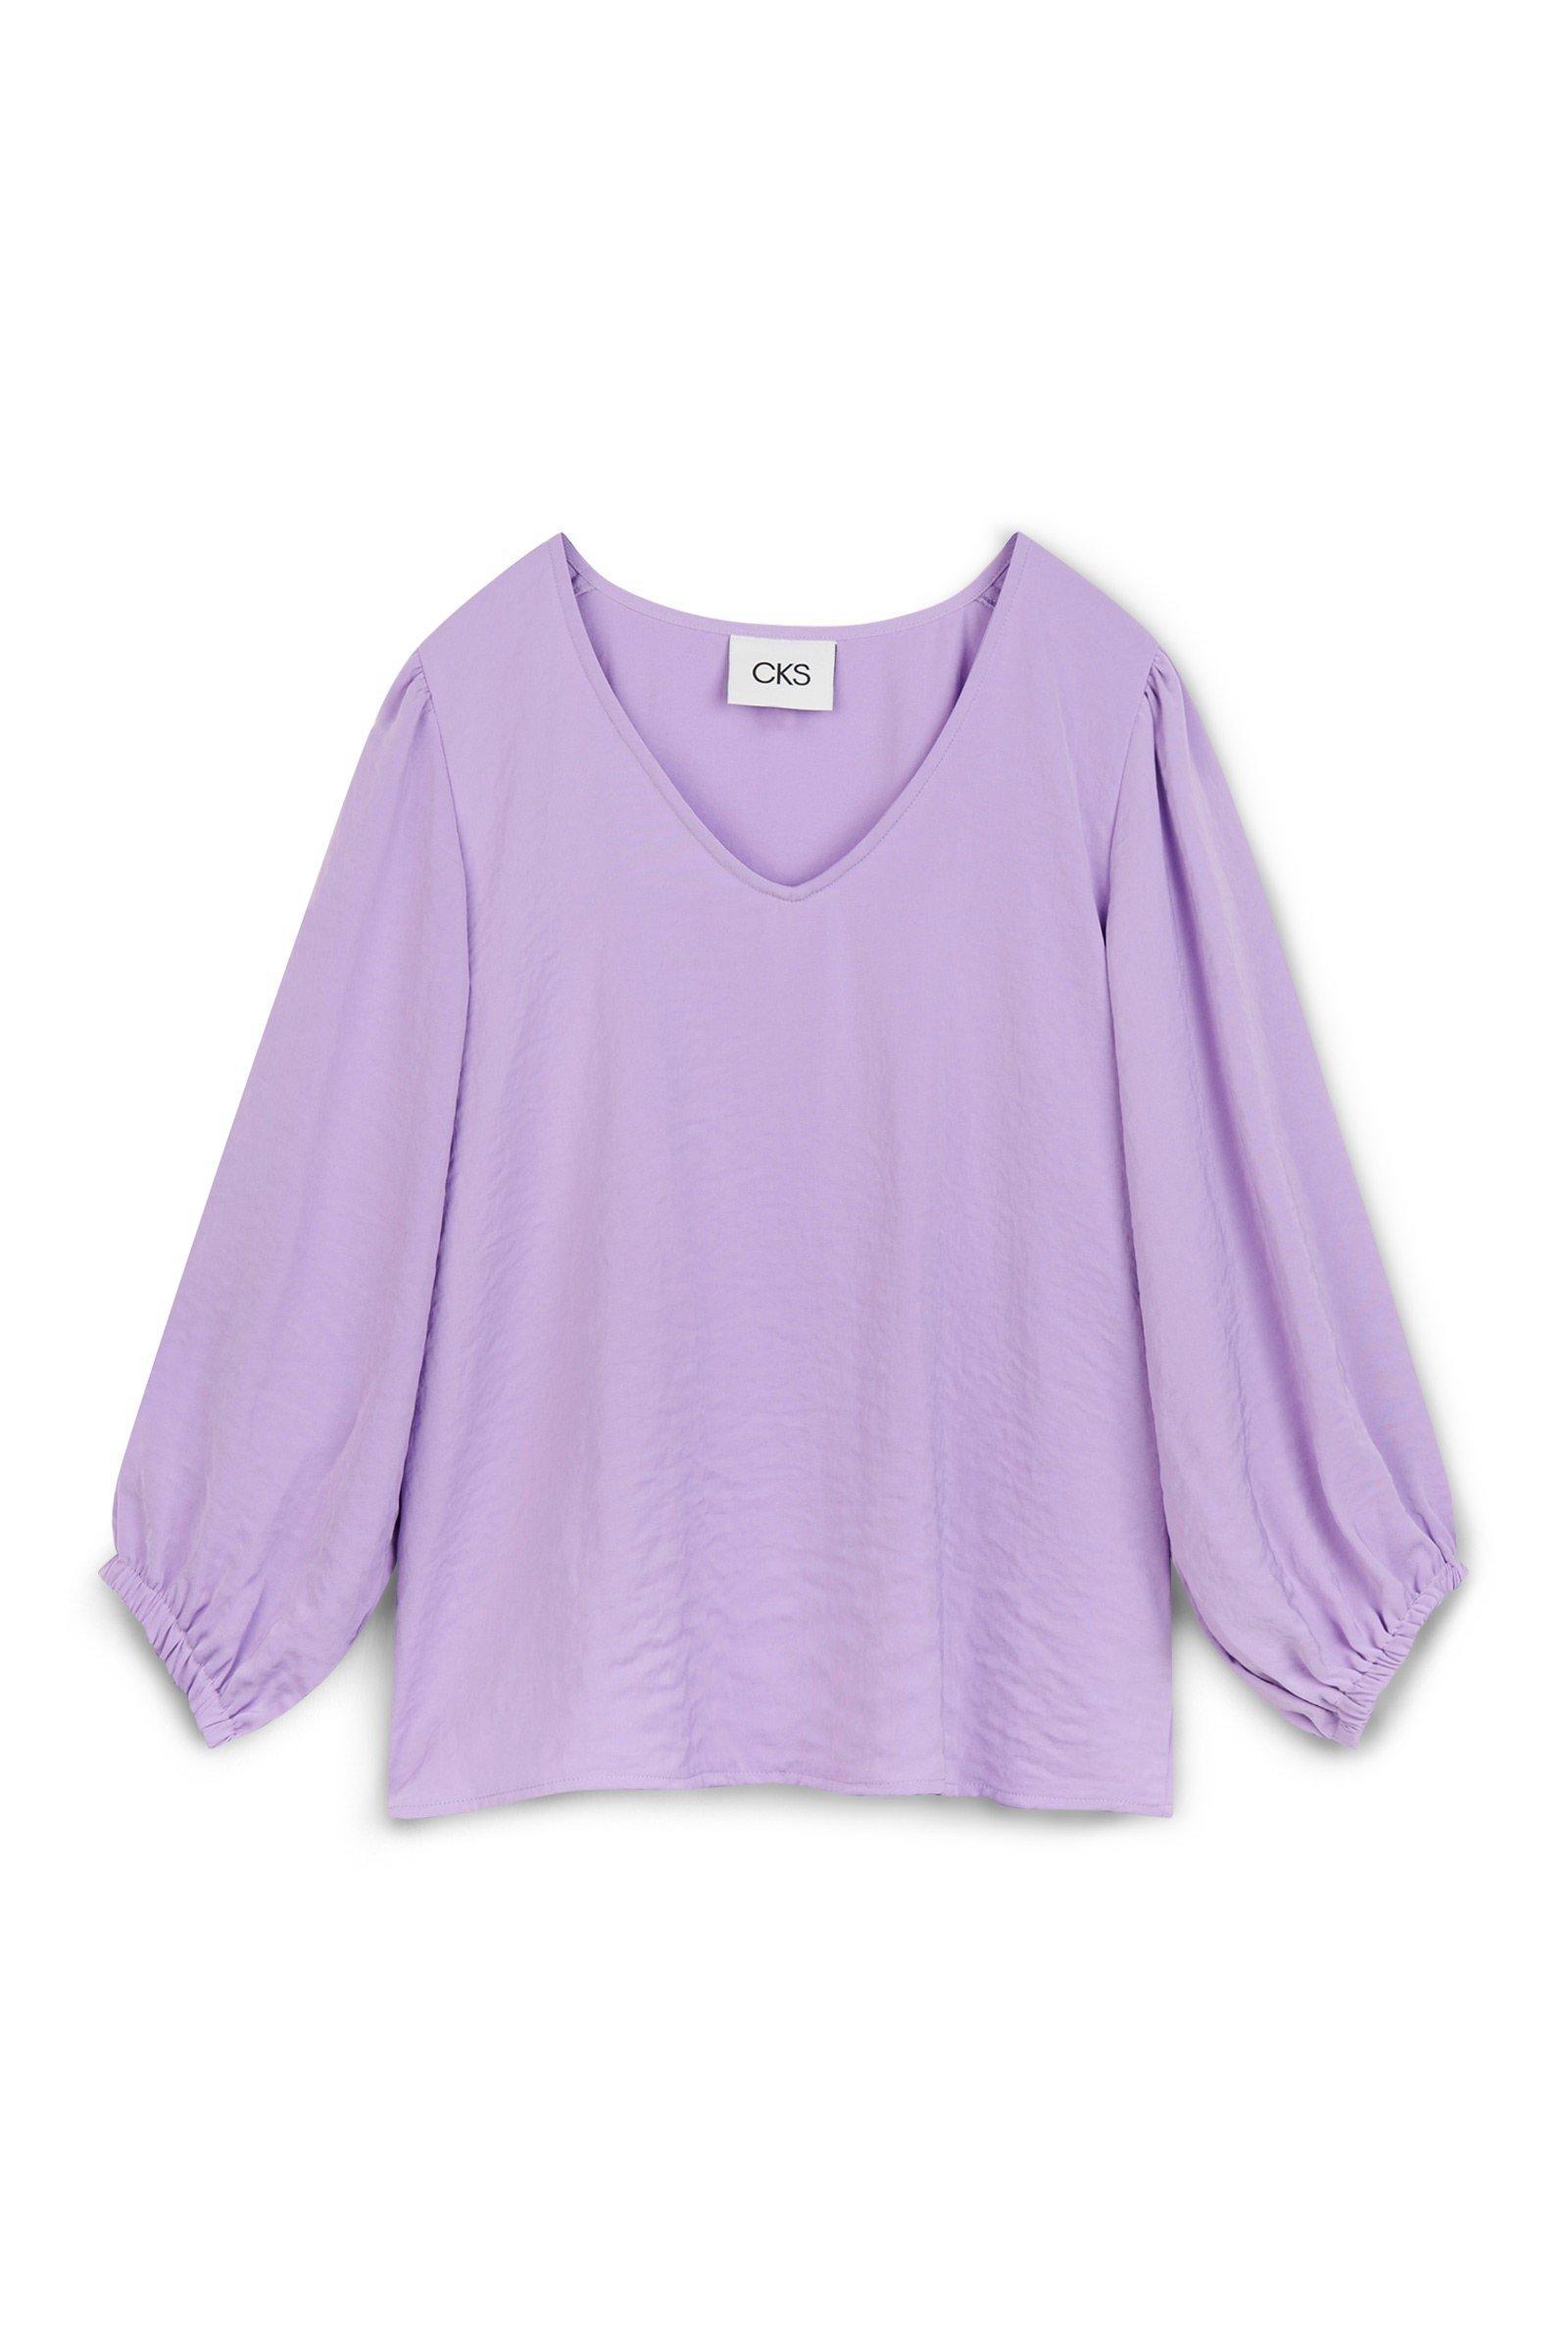 CKS Dames - RIKA - blouse korte mouwen - meerkleurig